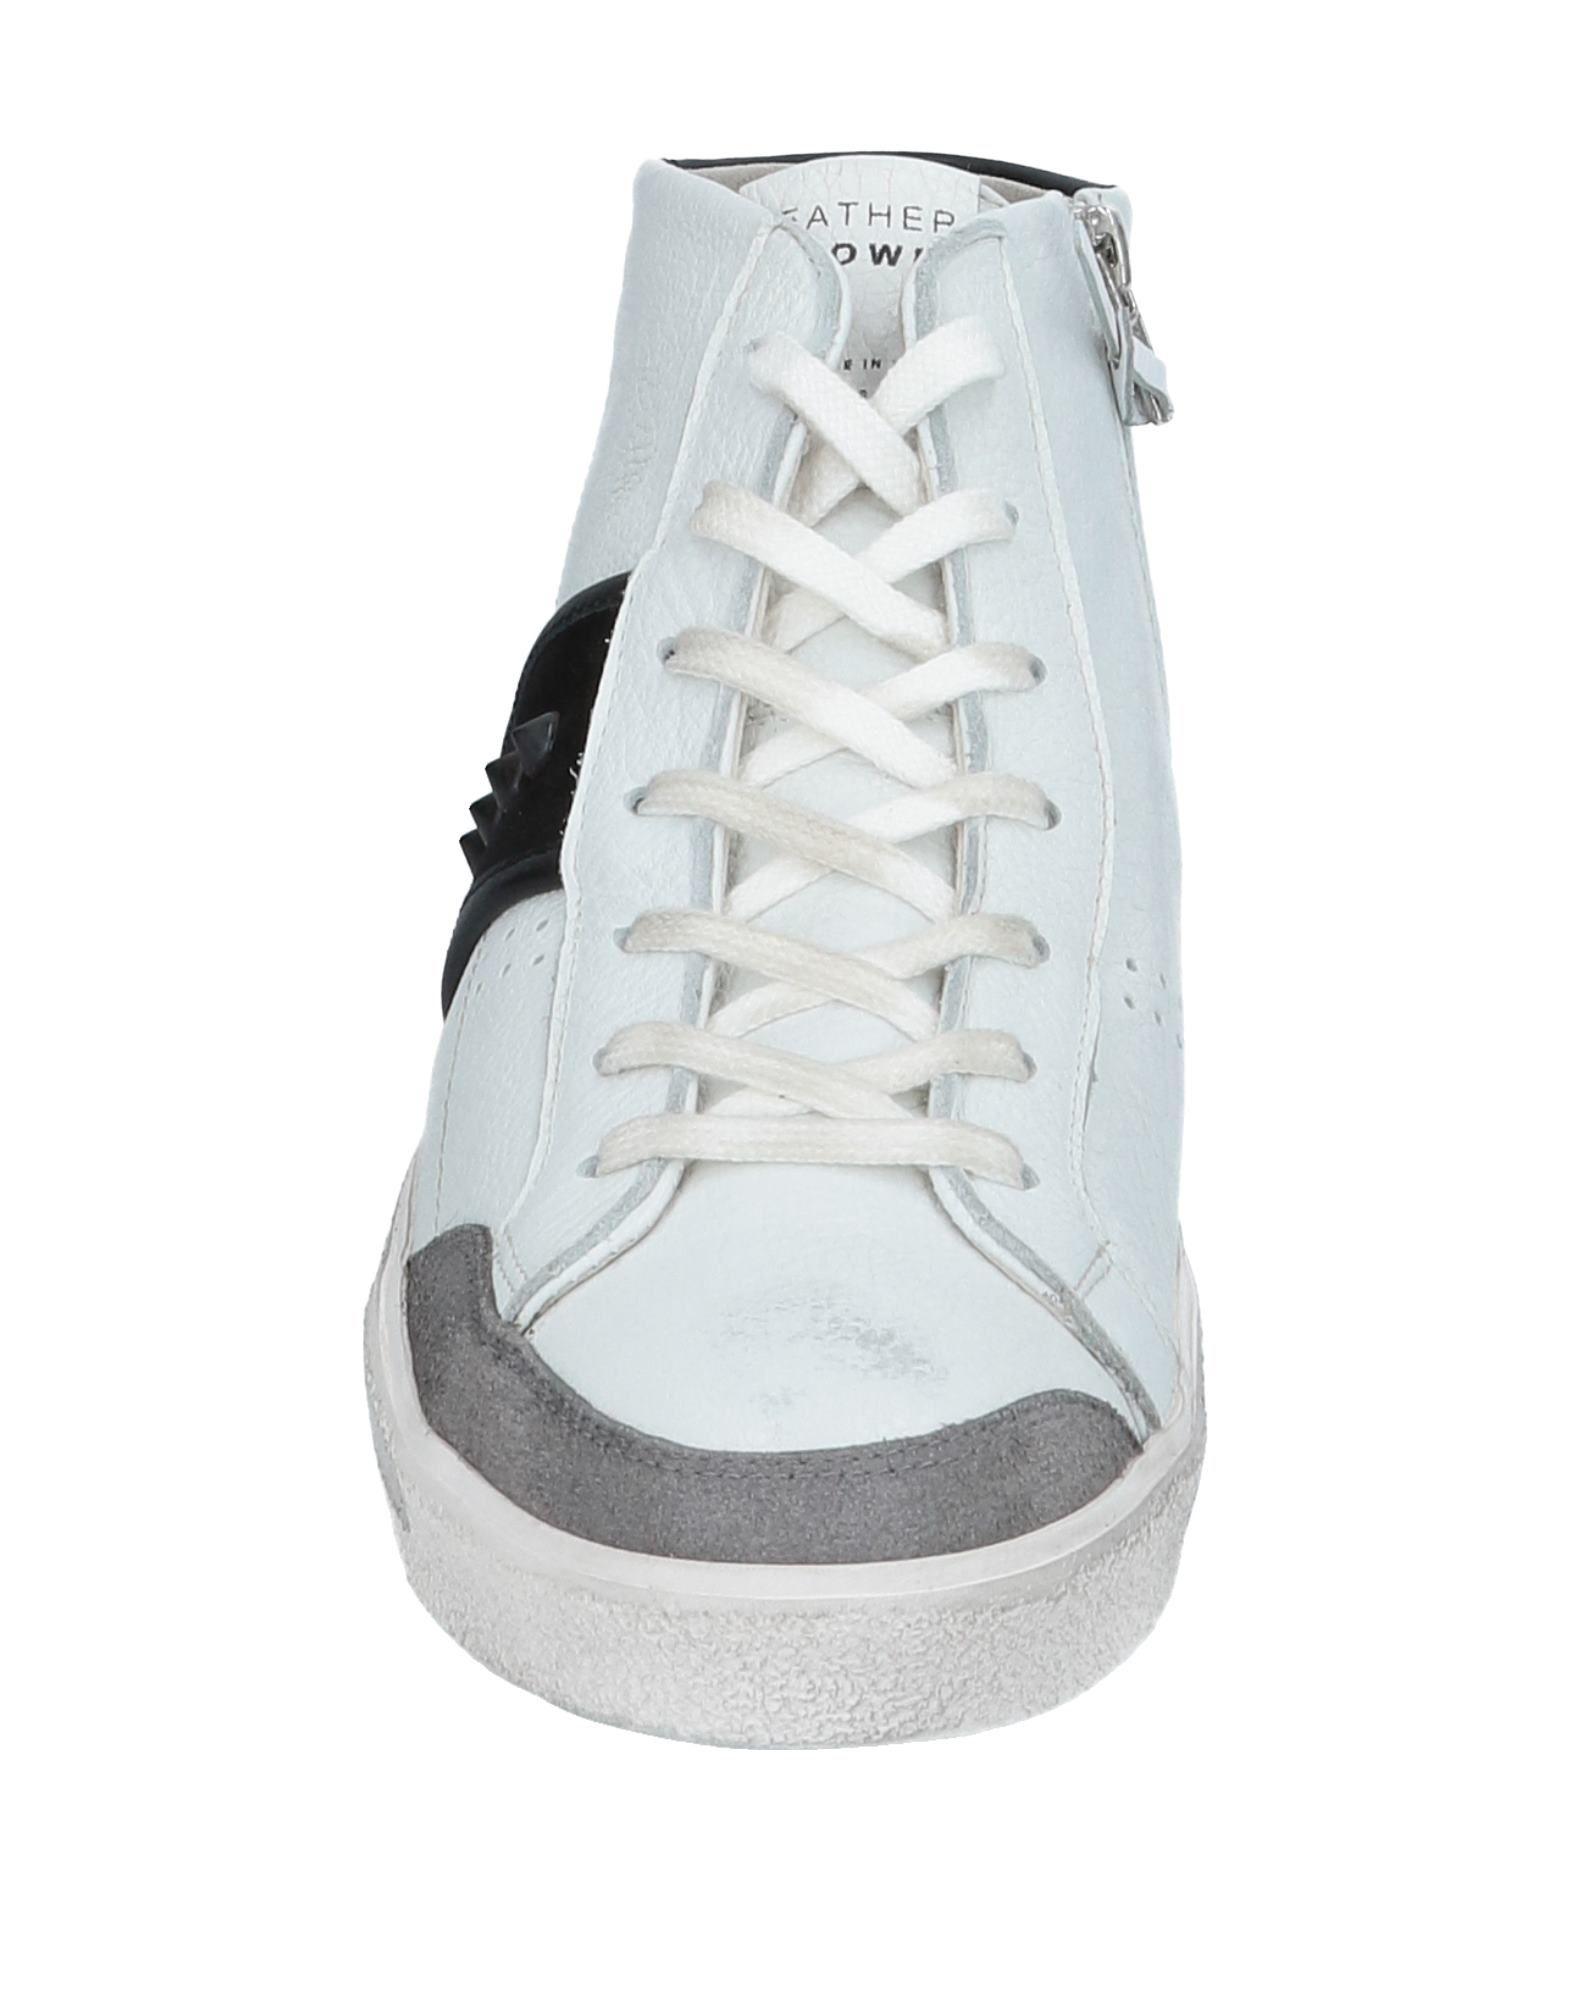 Leather Crown Sneakers Herren  11532005SR Gute Gute Gute Qualität beliebte Schuhe 1b6c4b